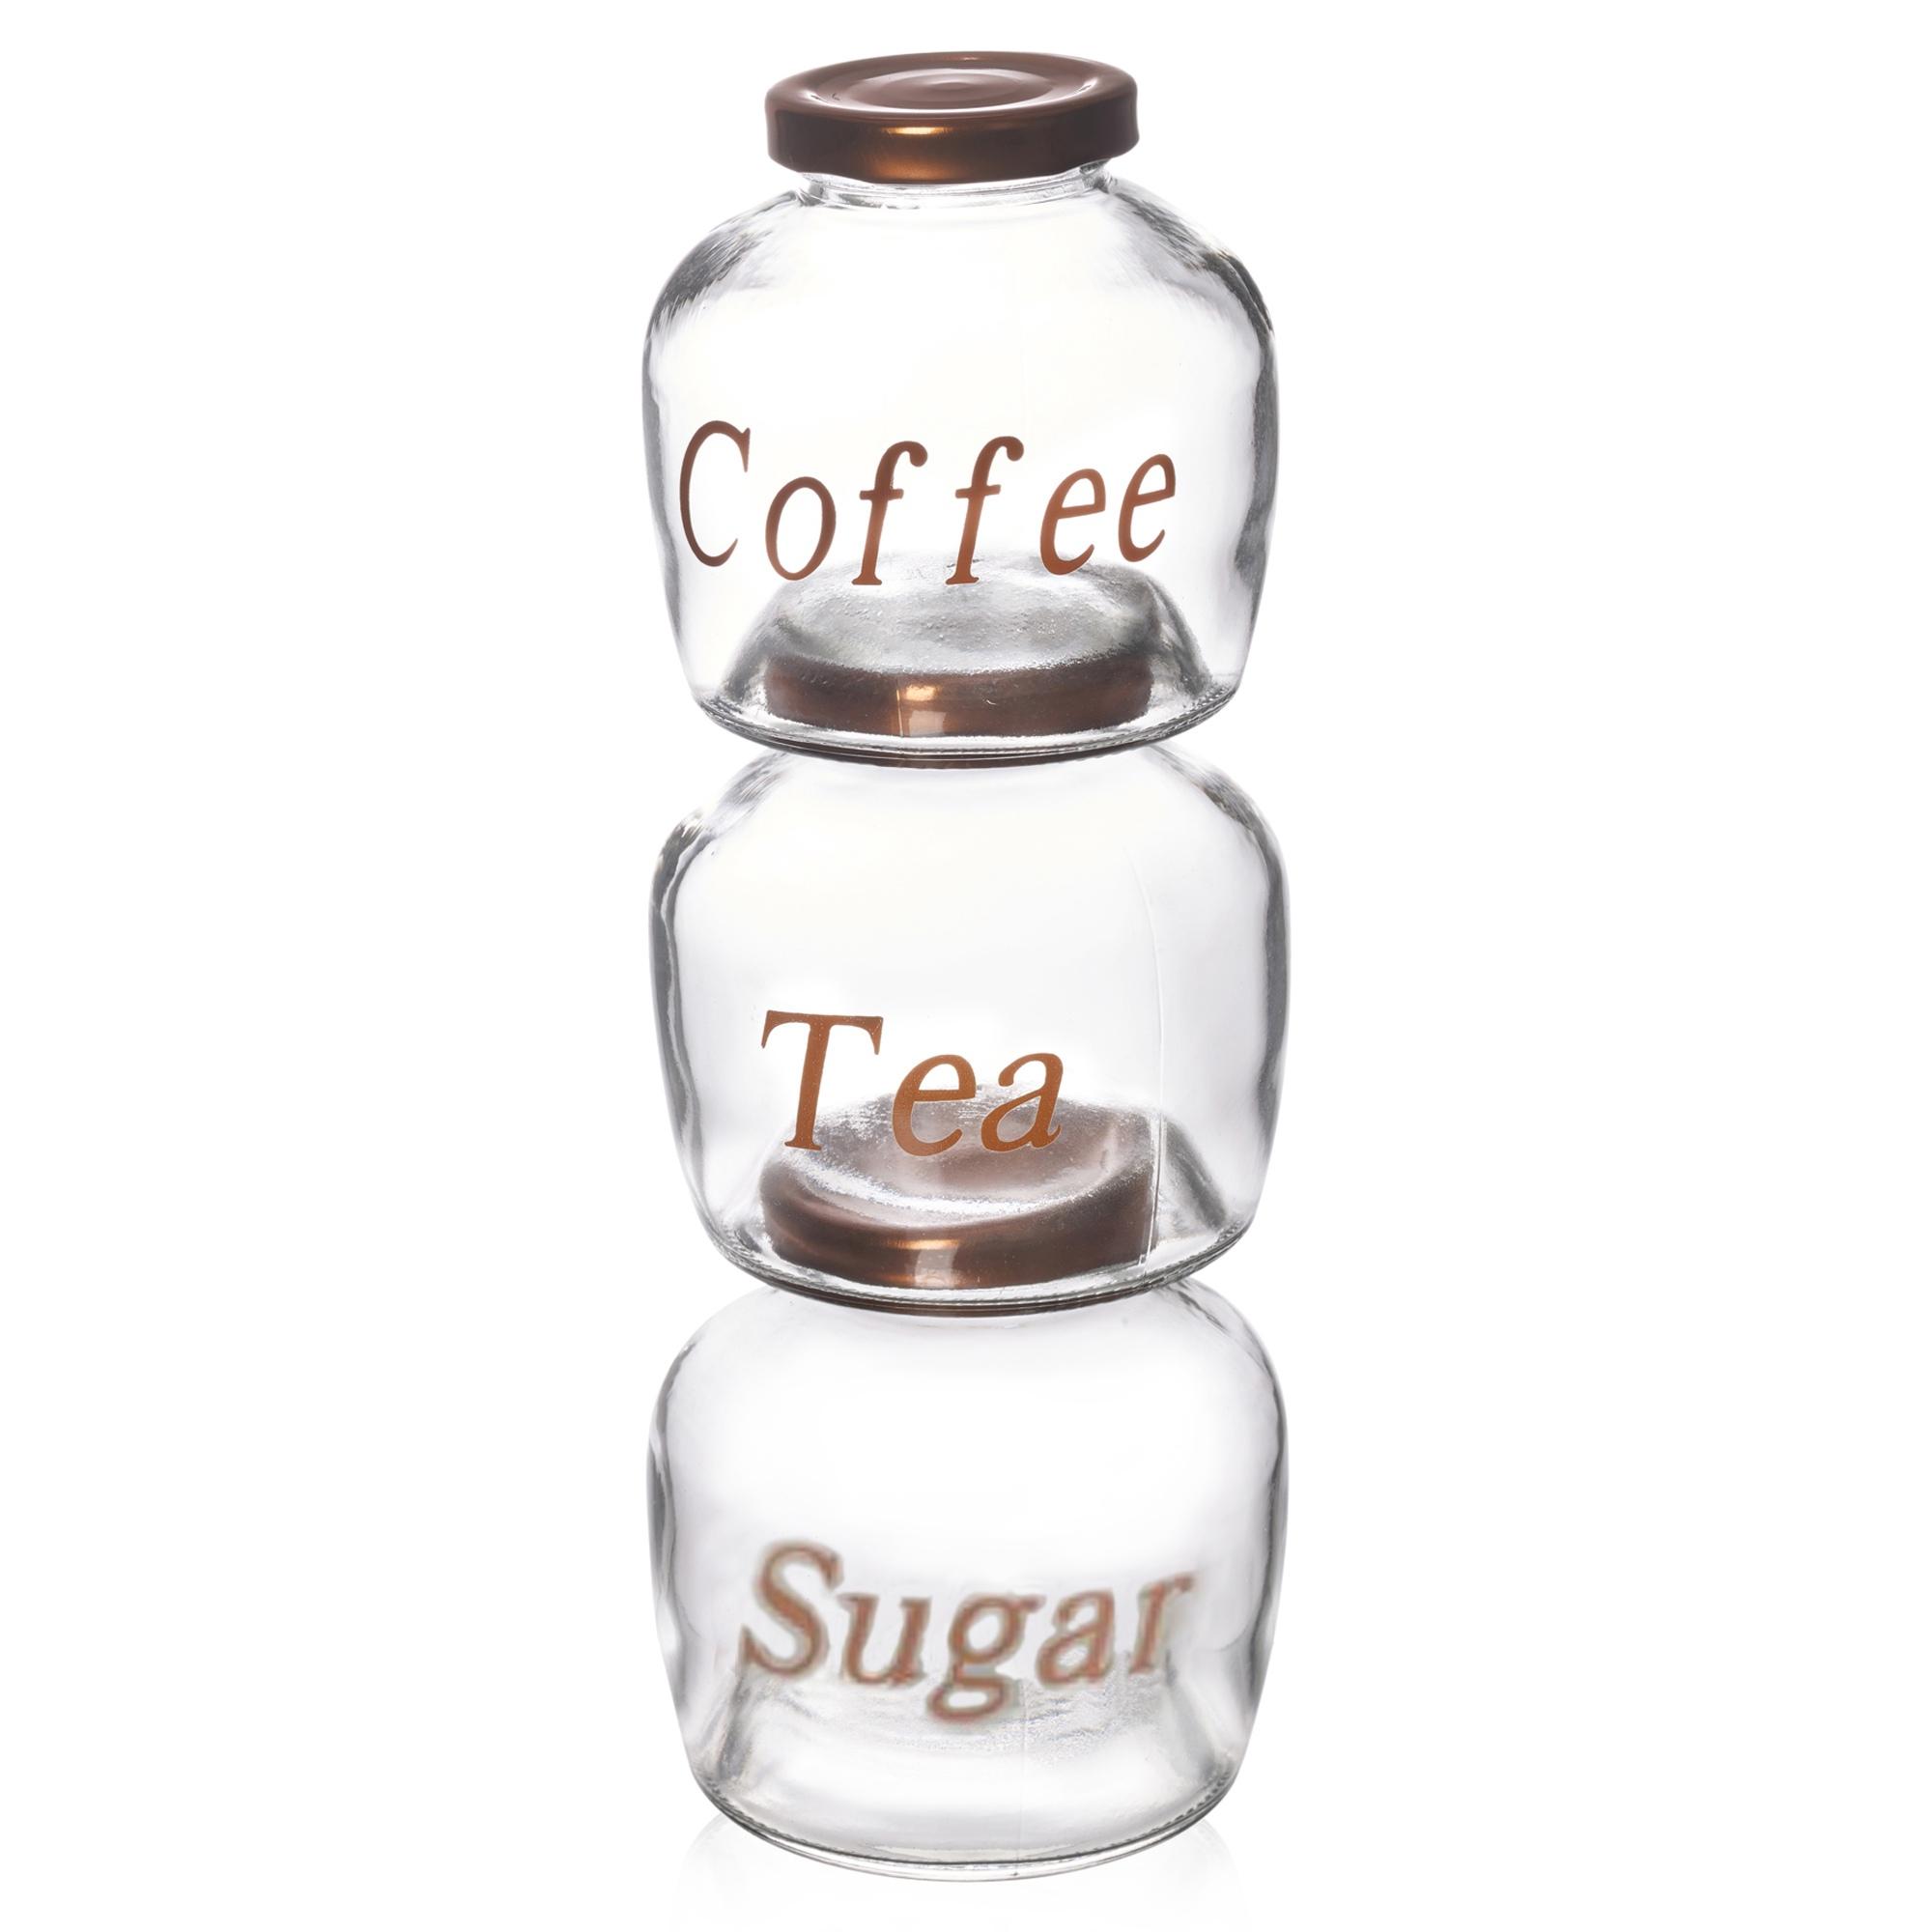 set of 3 tea coffee sugar glass jar 400ml canister jam. Black Bedroom Furniture Sets. Home Design Ideas